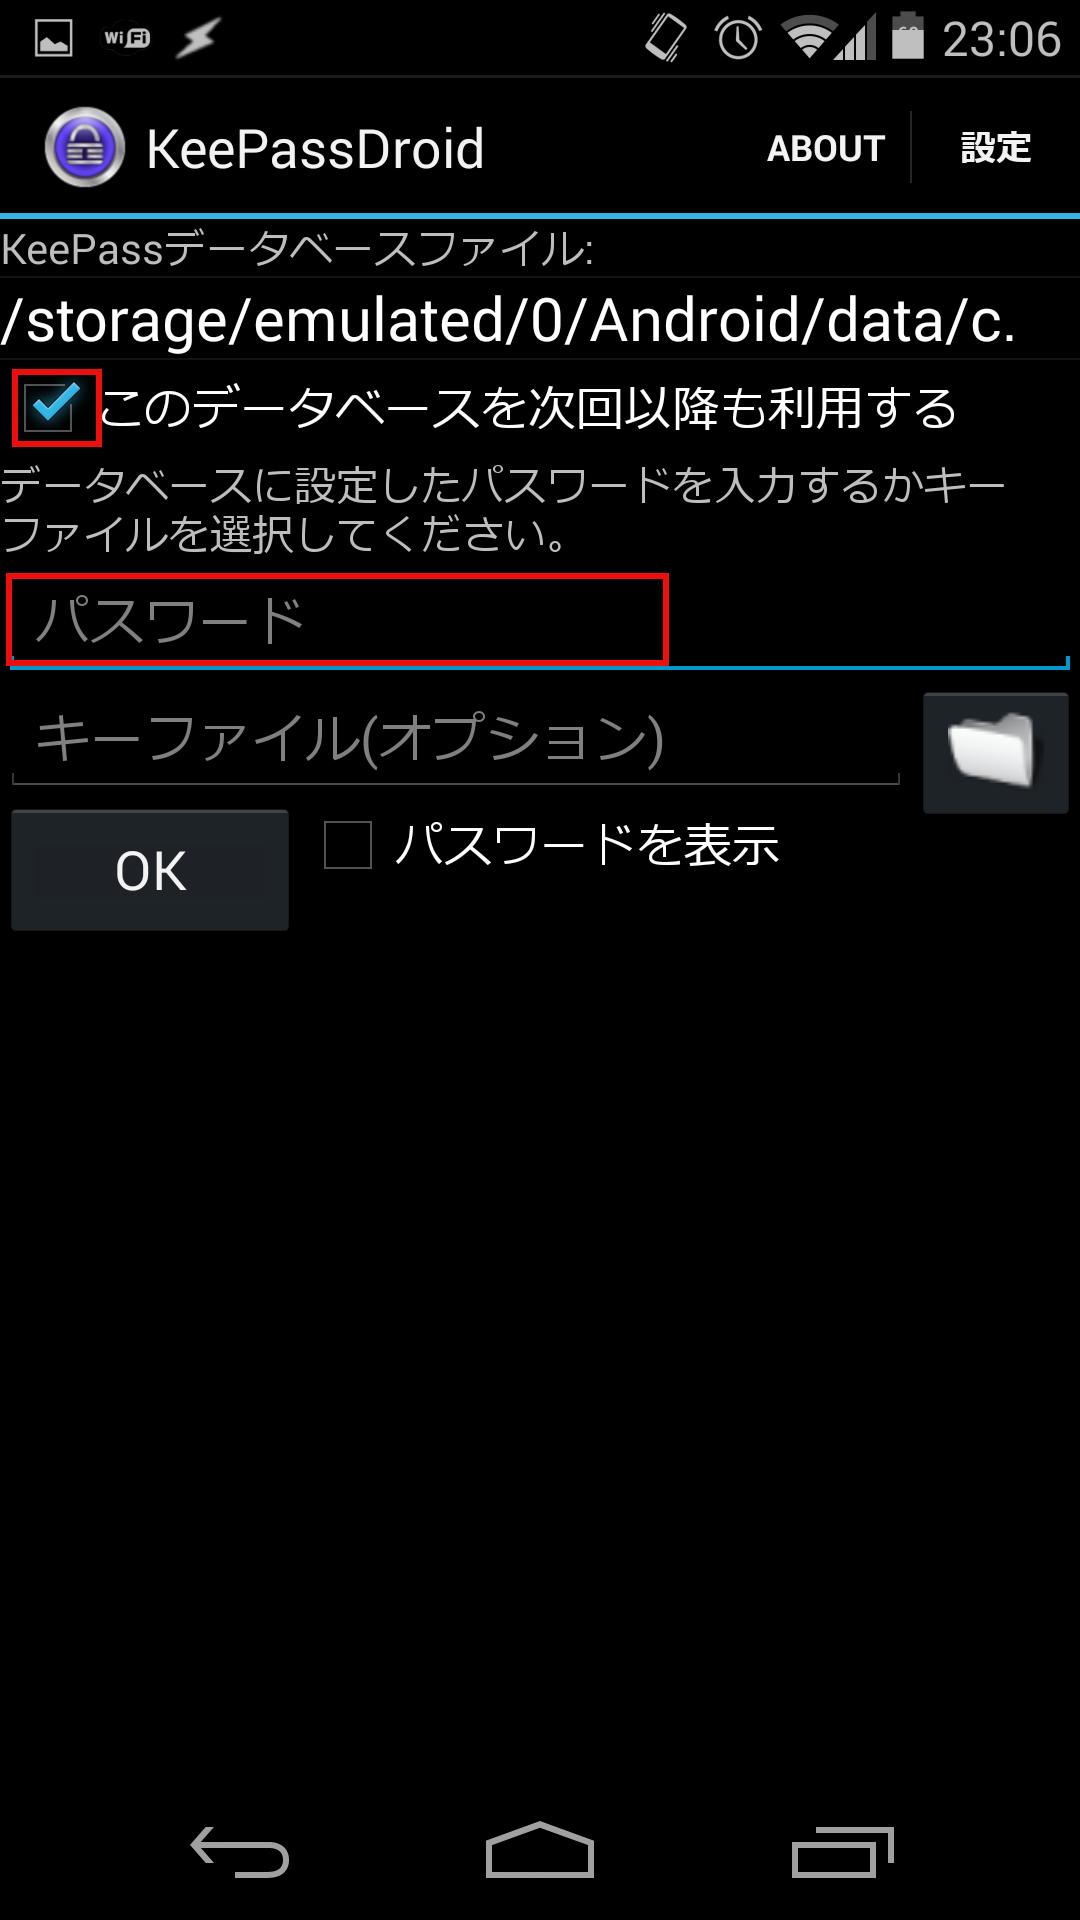 Screenshot_2013-12-09-23-06-33